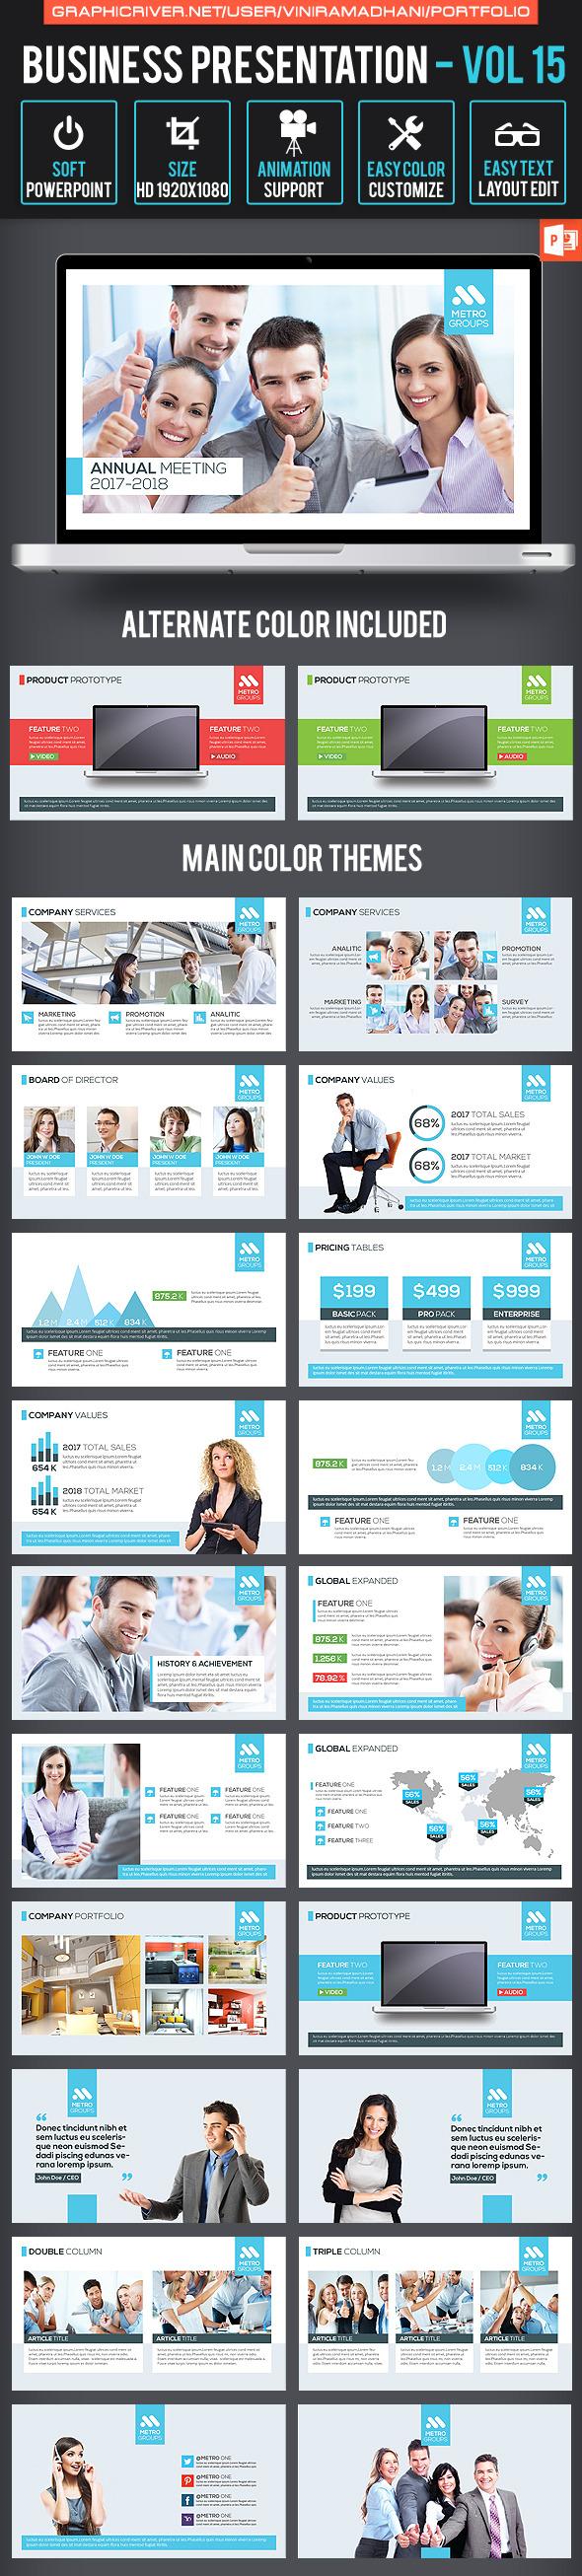 Business Presentation Volume 15